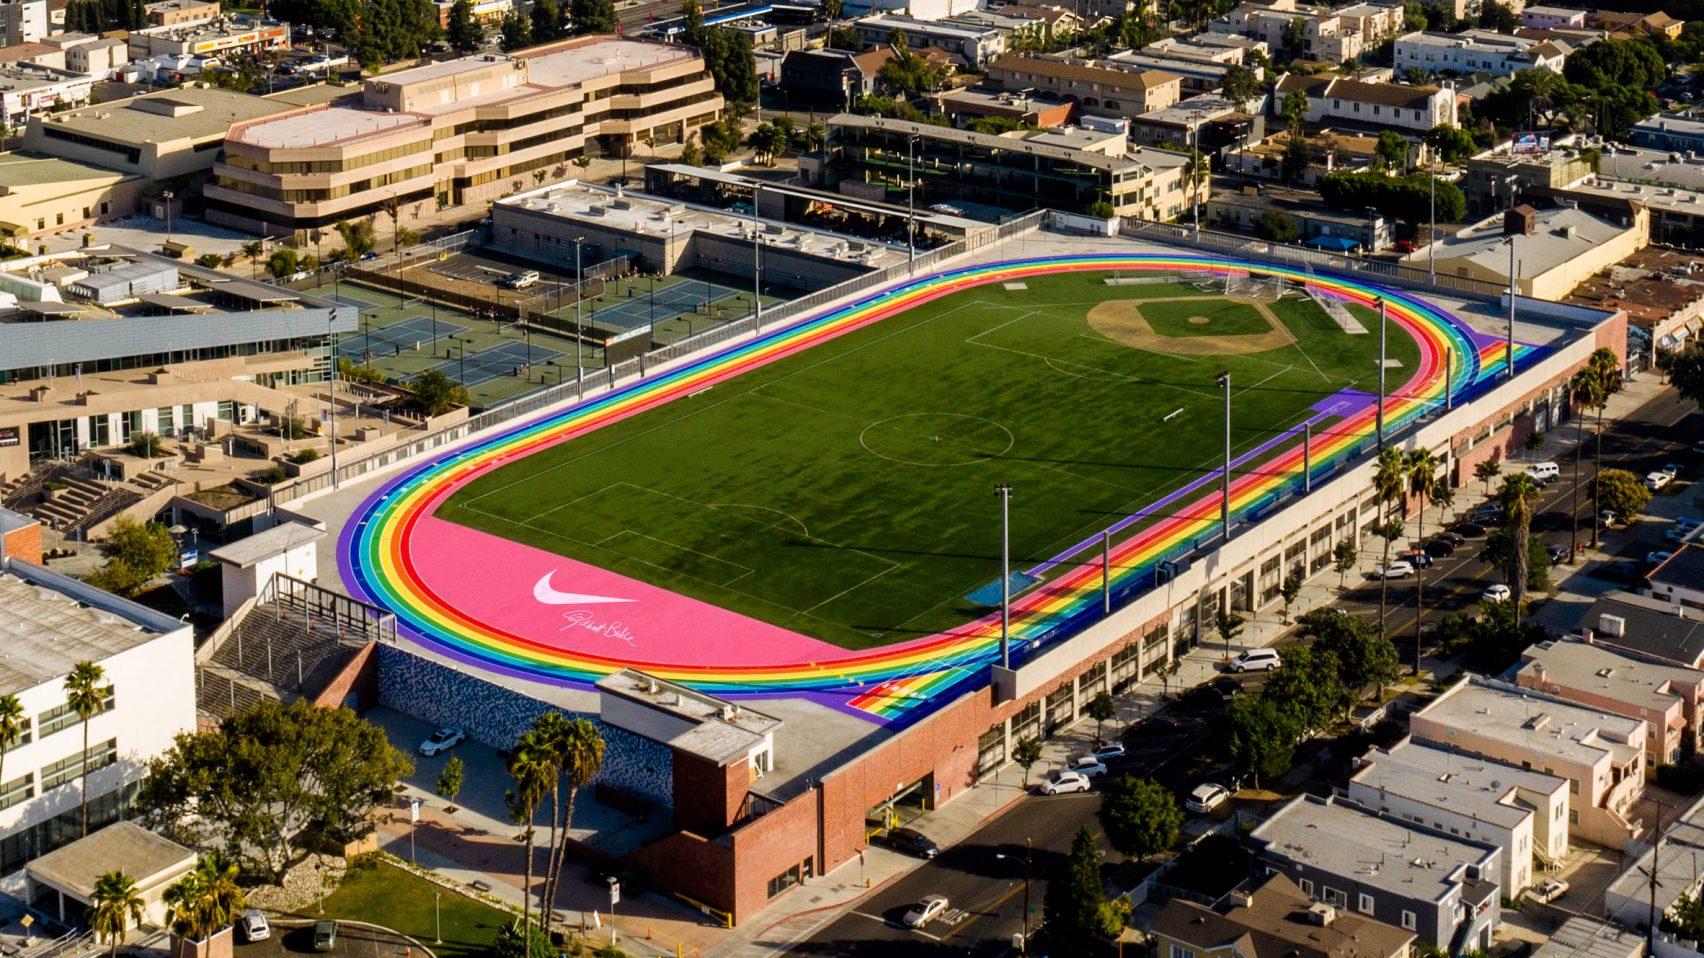 Evaluación construcción naval ironía  Nike pinta pista de corrida em Los Angeles com as cores da bandeira LGBT+    CASA.COM.BR